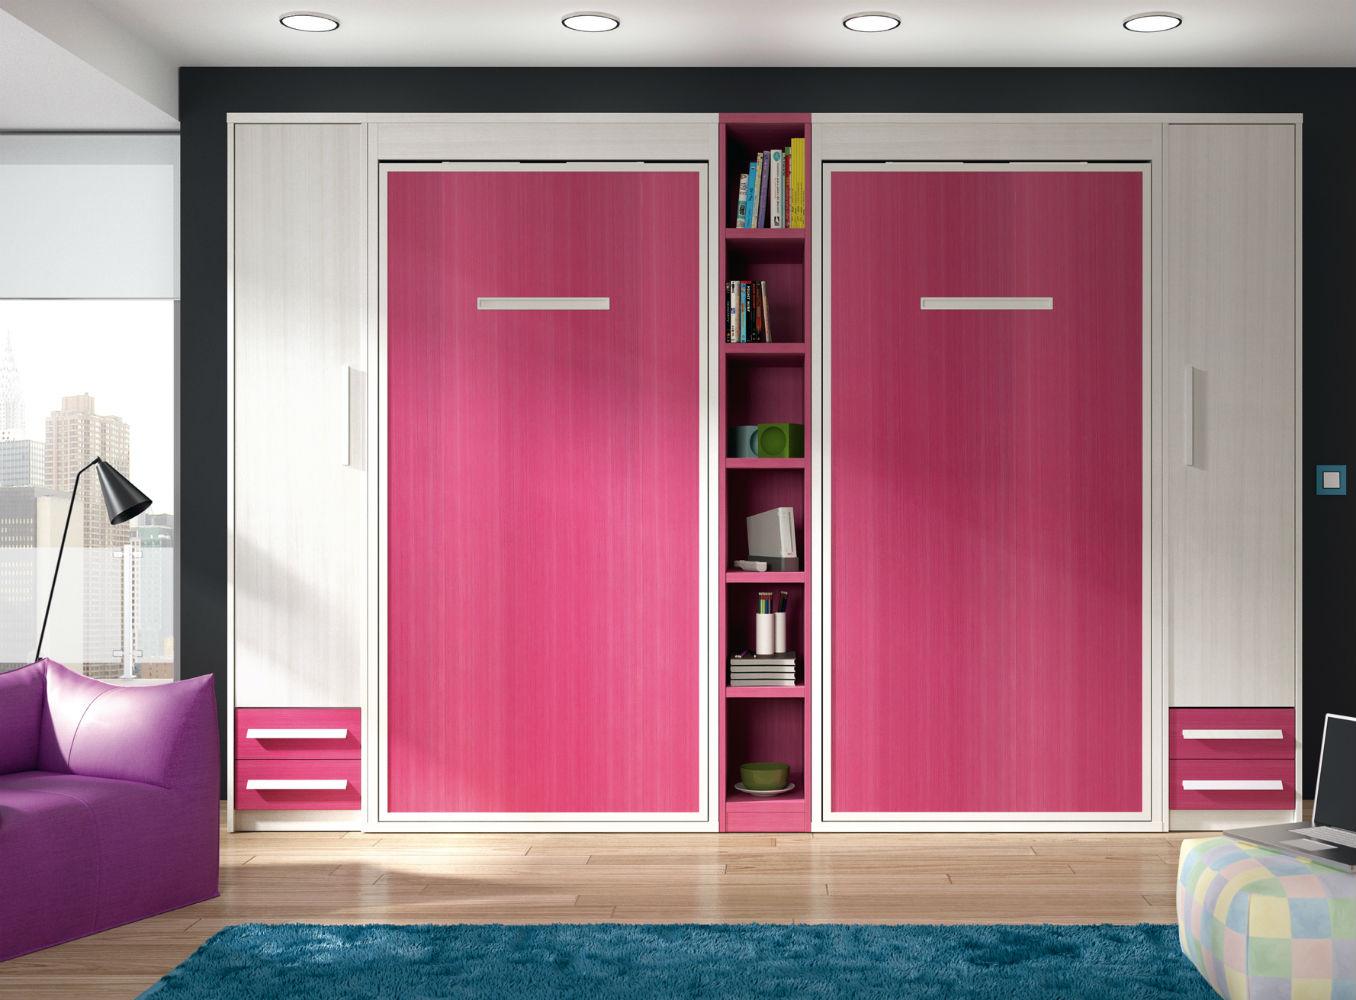 Dormitorio infantil juvenil moderno literas abatibles 69 f225 - Dormitorios dobles juveniles ...